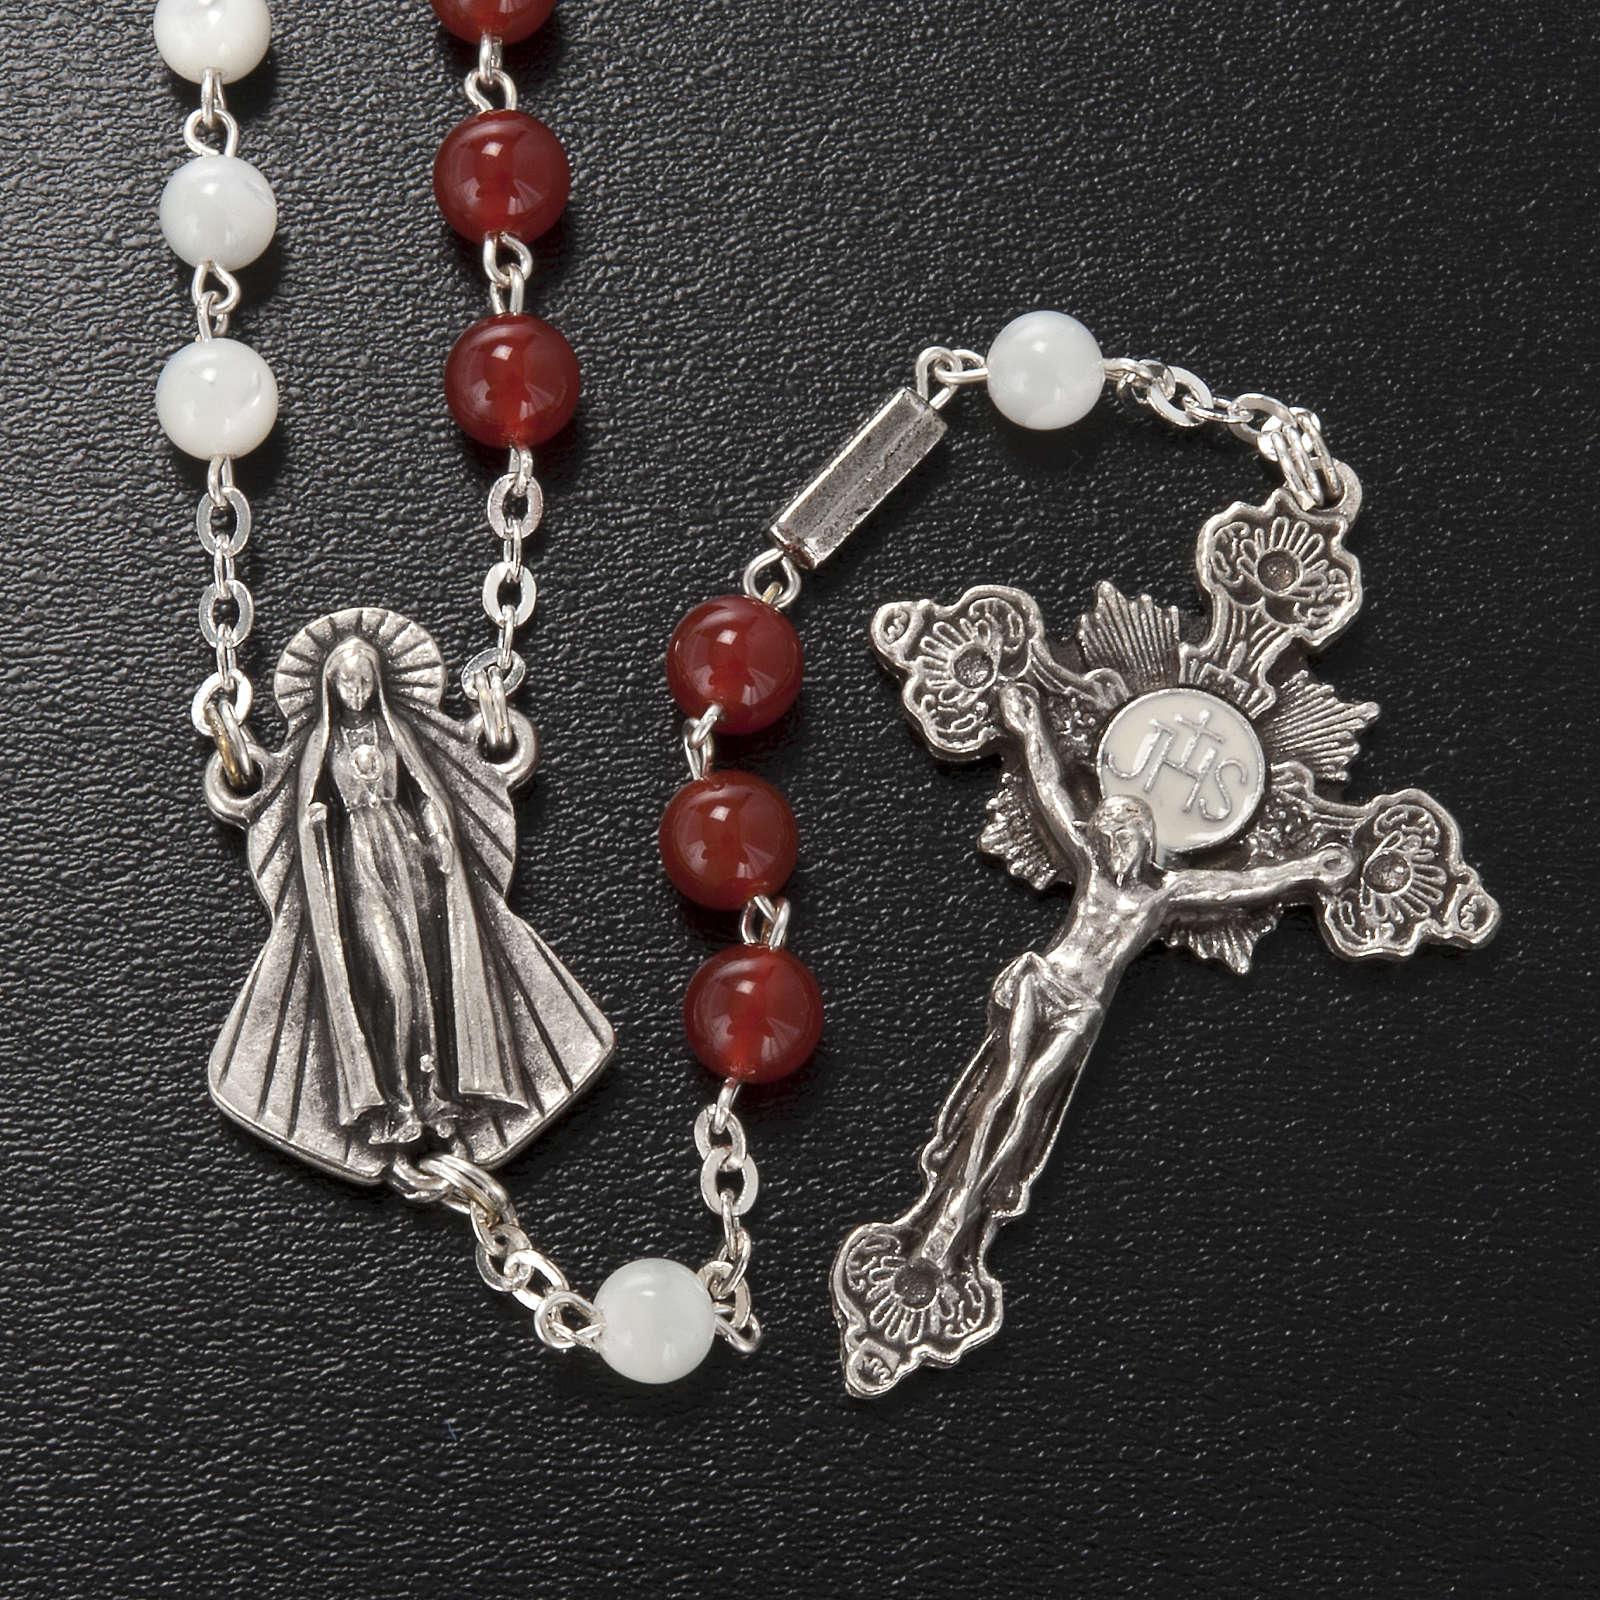 Rosario Ghirelli agata madreperla Sacro Cuore e Misericordia 4